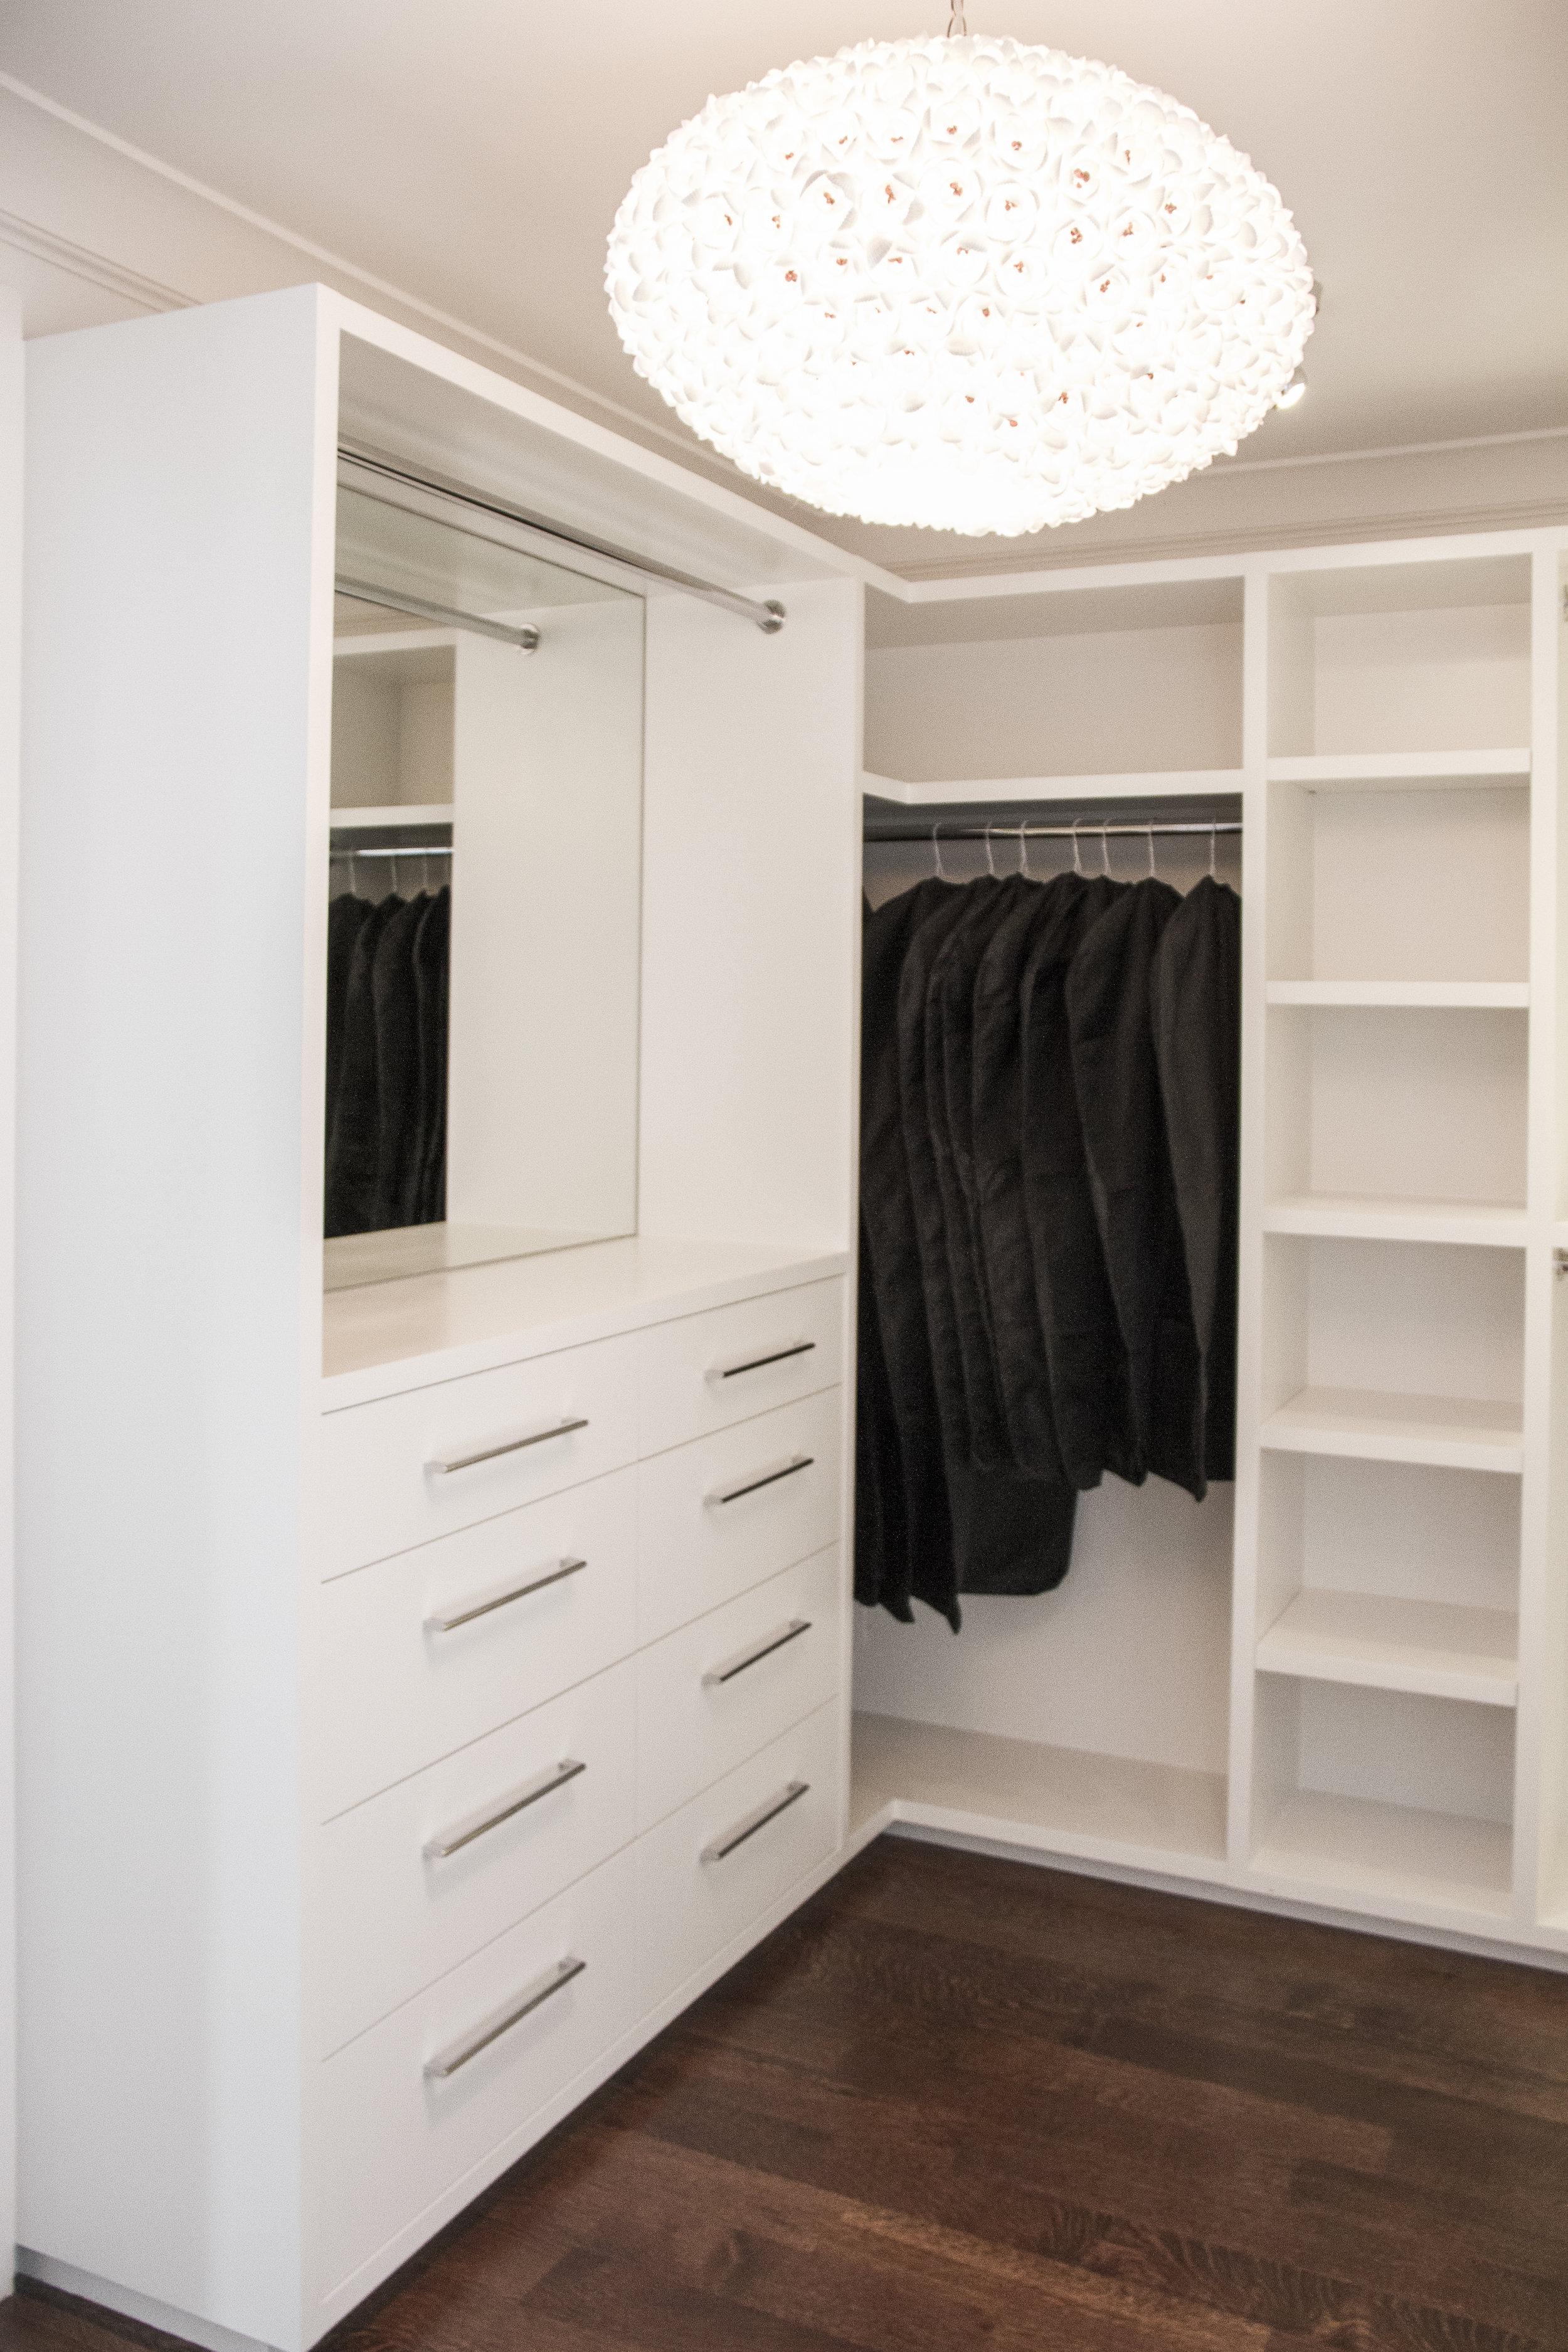 closet, white, modern, storage, wardrobe, hangers, clothes, clothes rack, hardwood floor